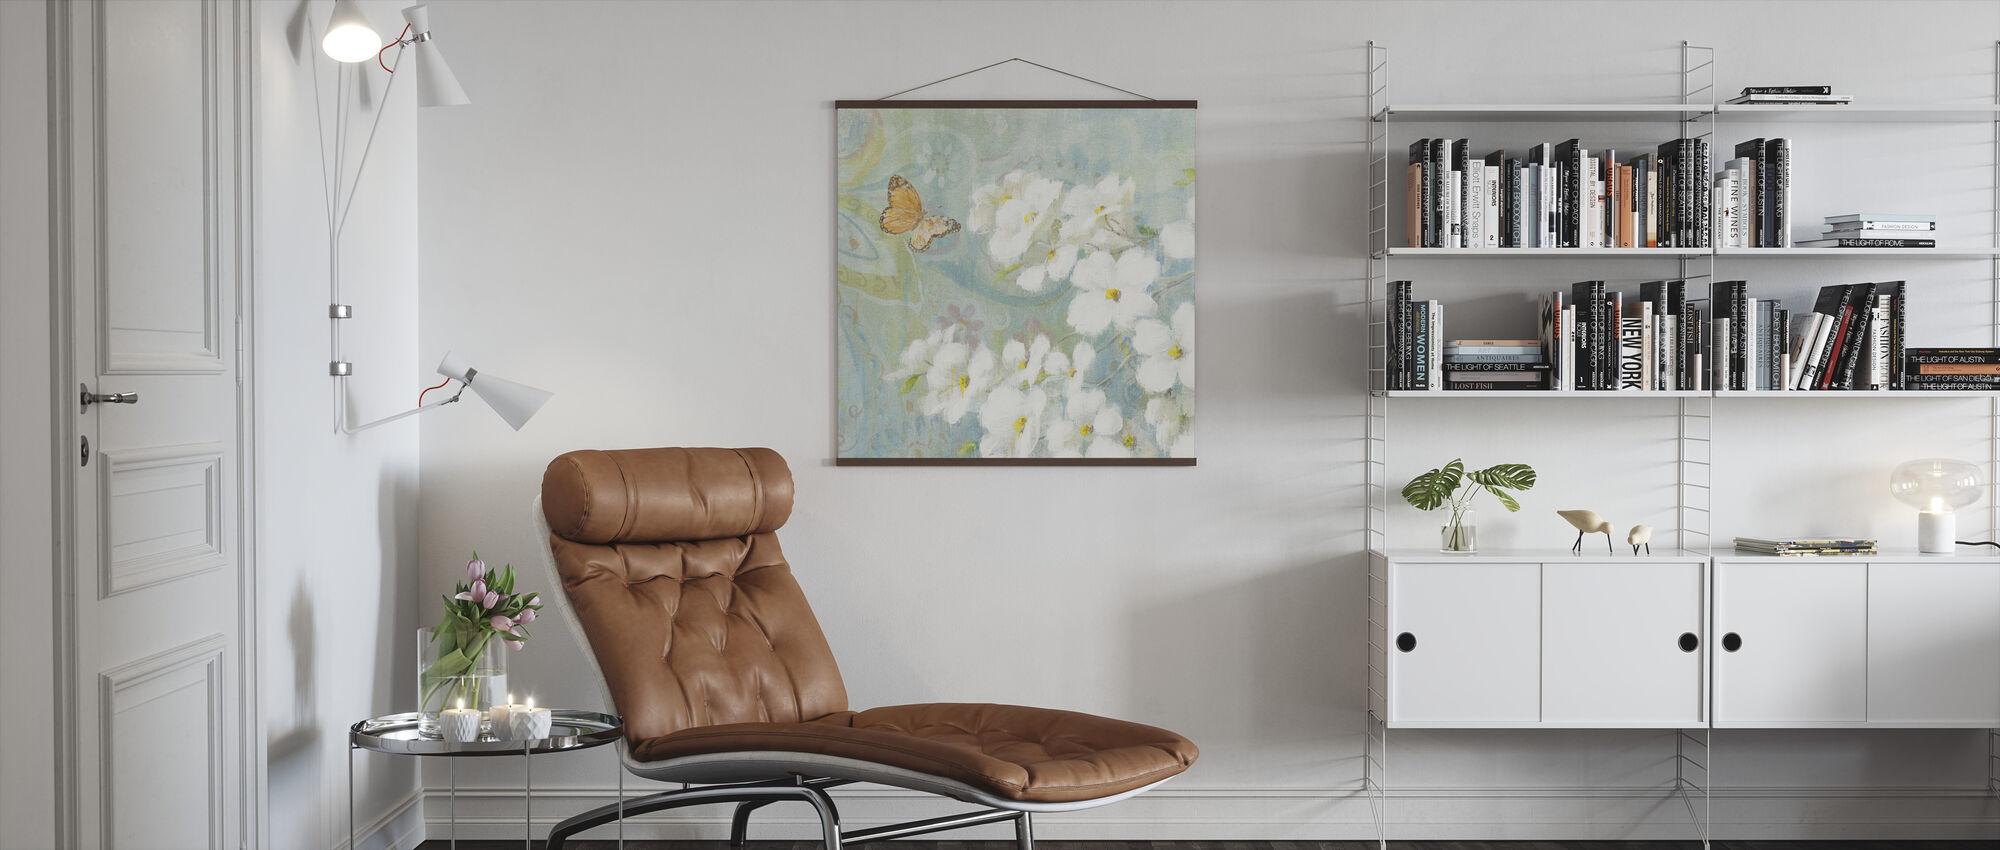 Forår drøm 1 - Plakat - Stue